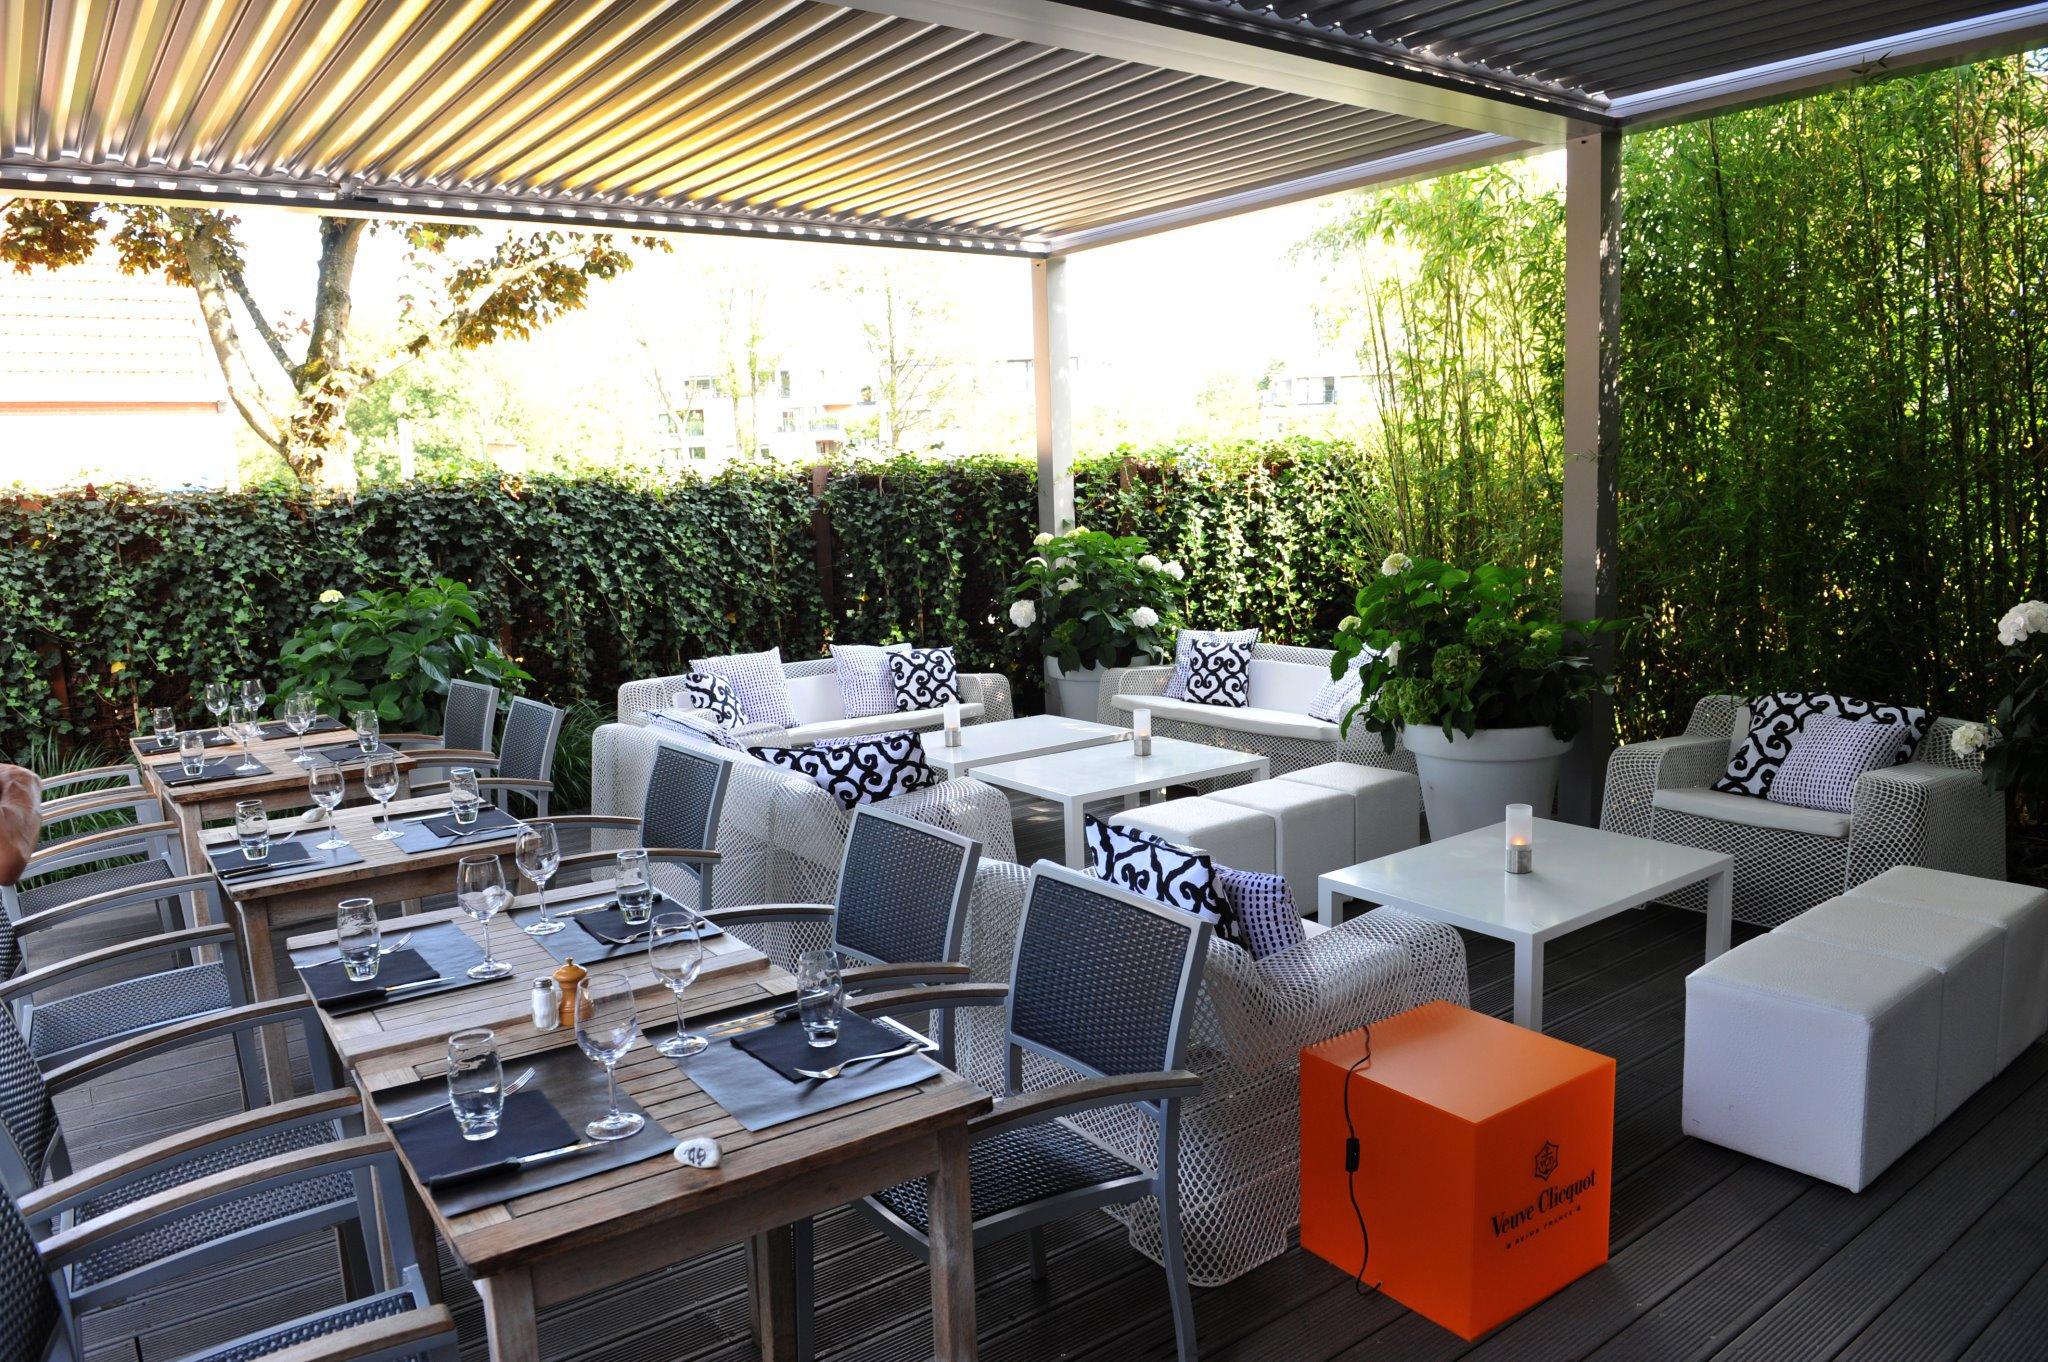 IL GIARDINO - Restaurant Français - Uccle 1180